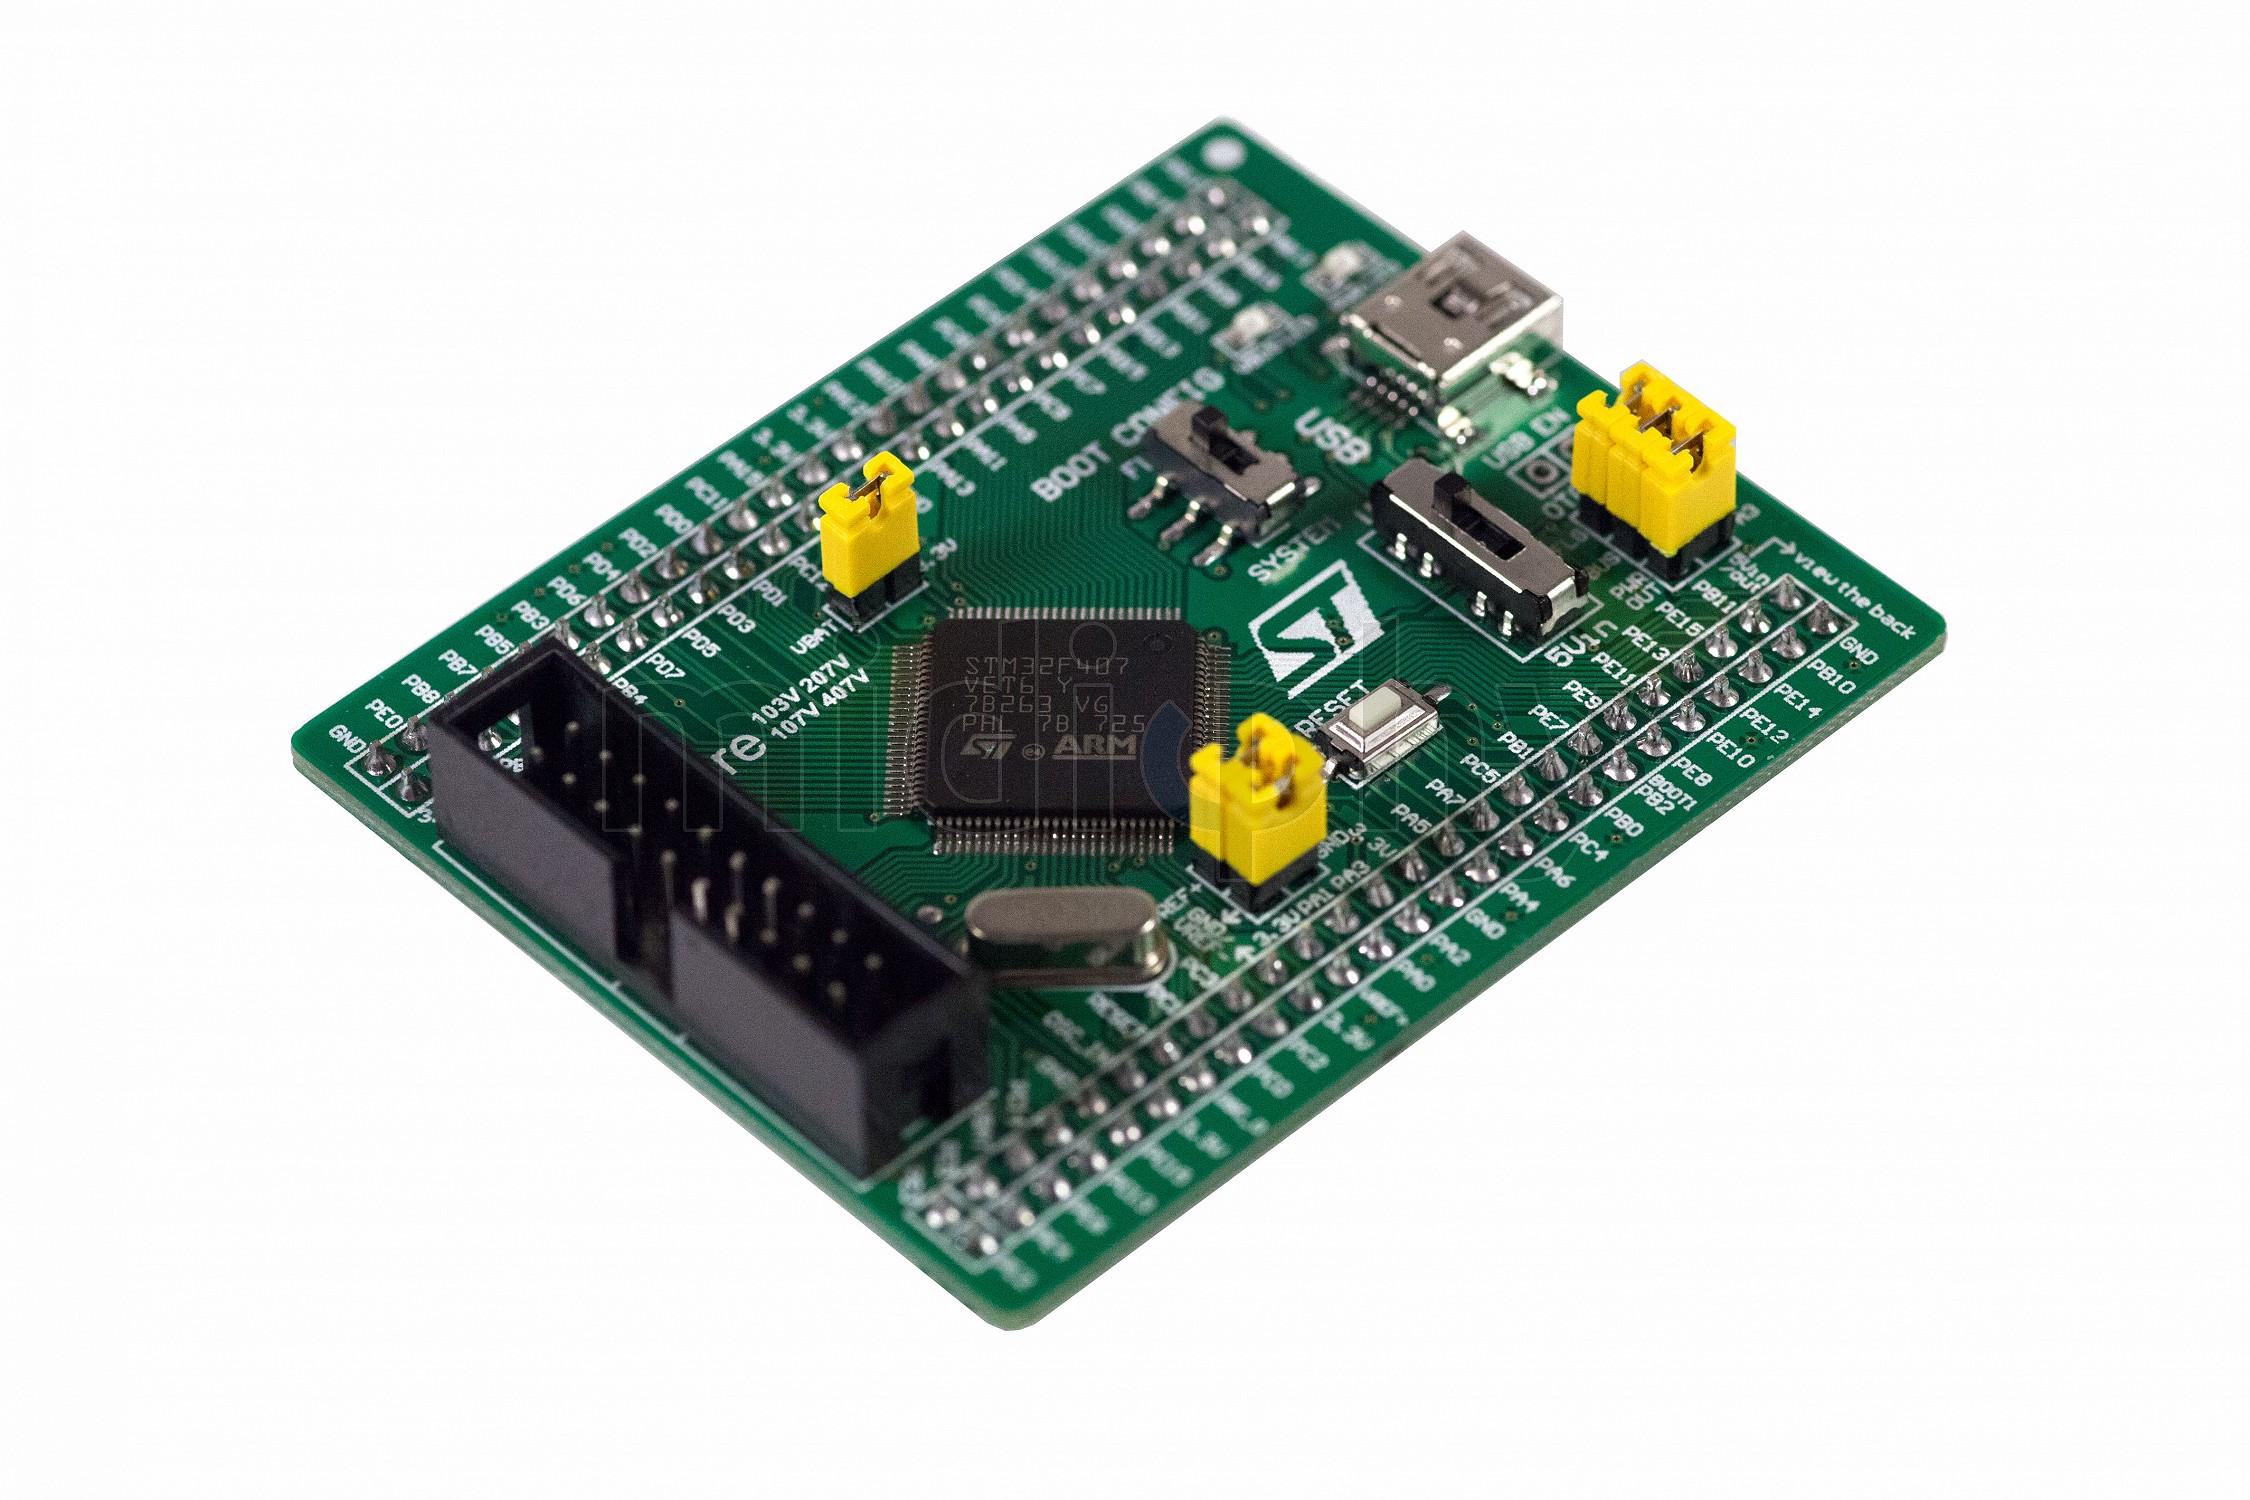 midiphy - MCU Core407V, 1MB flash, bootloader - MIDIbox shop, DIY